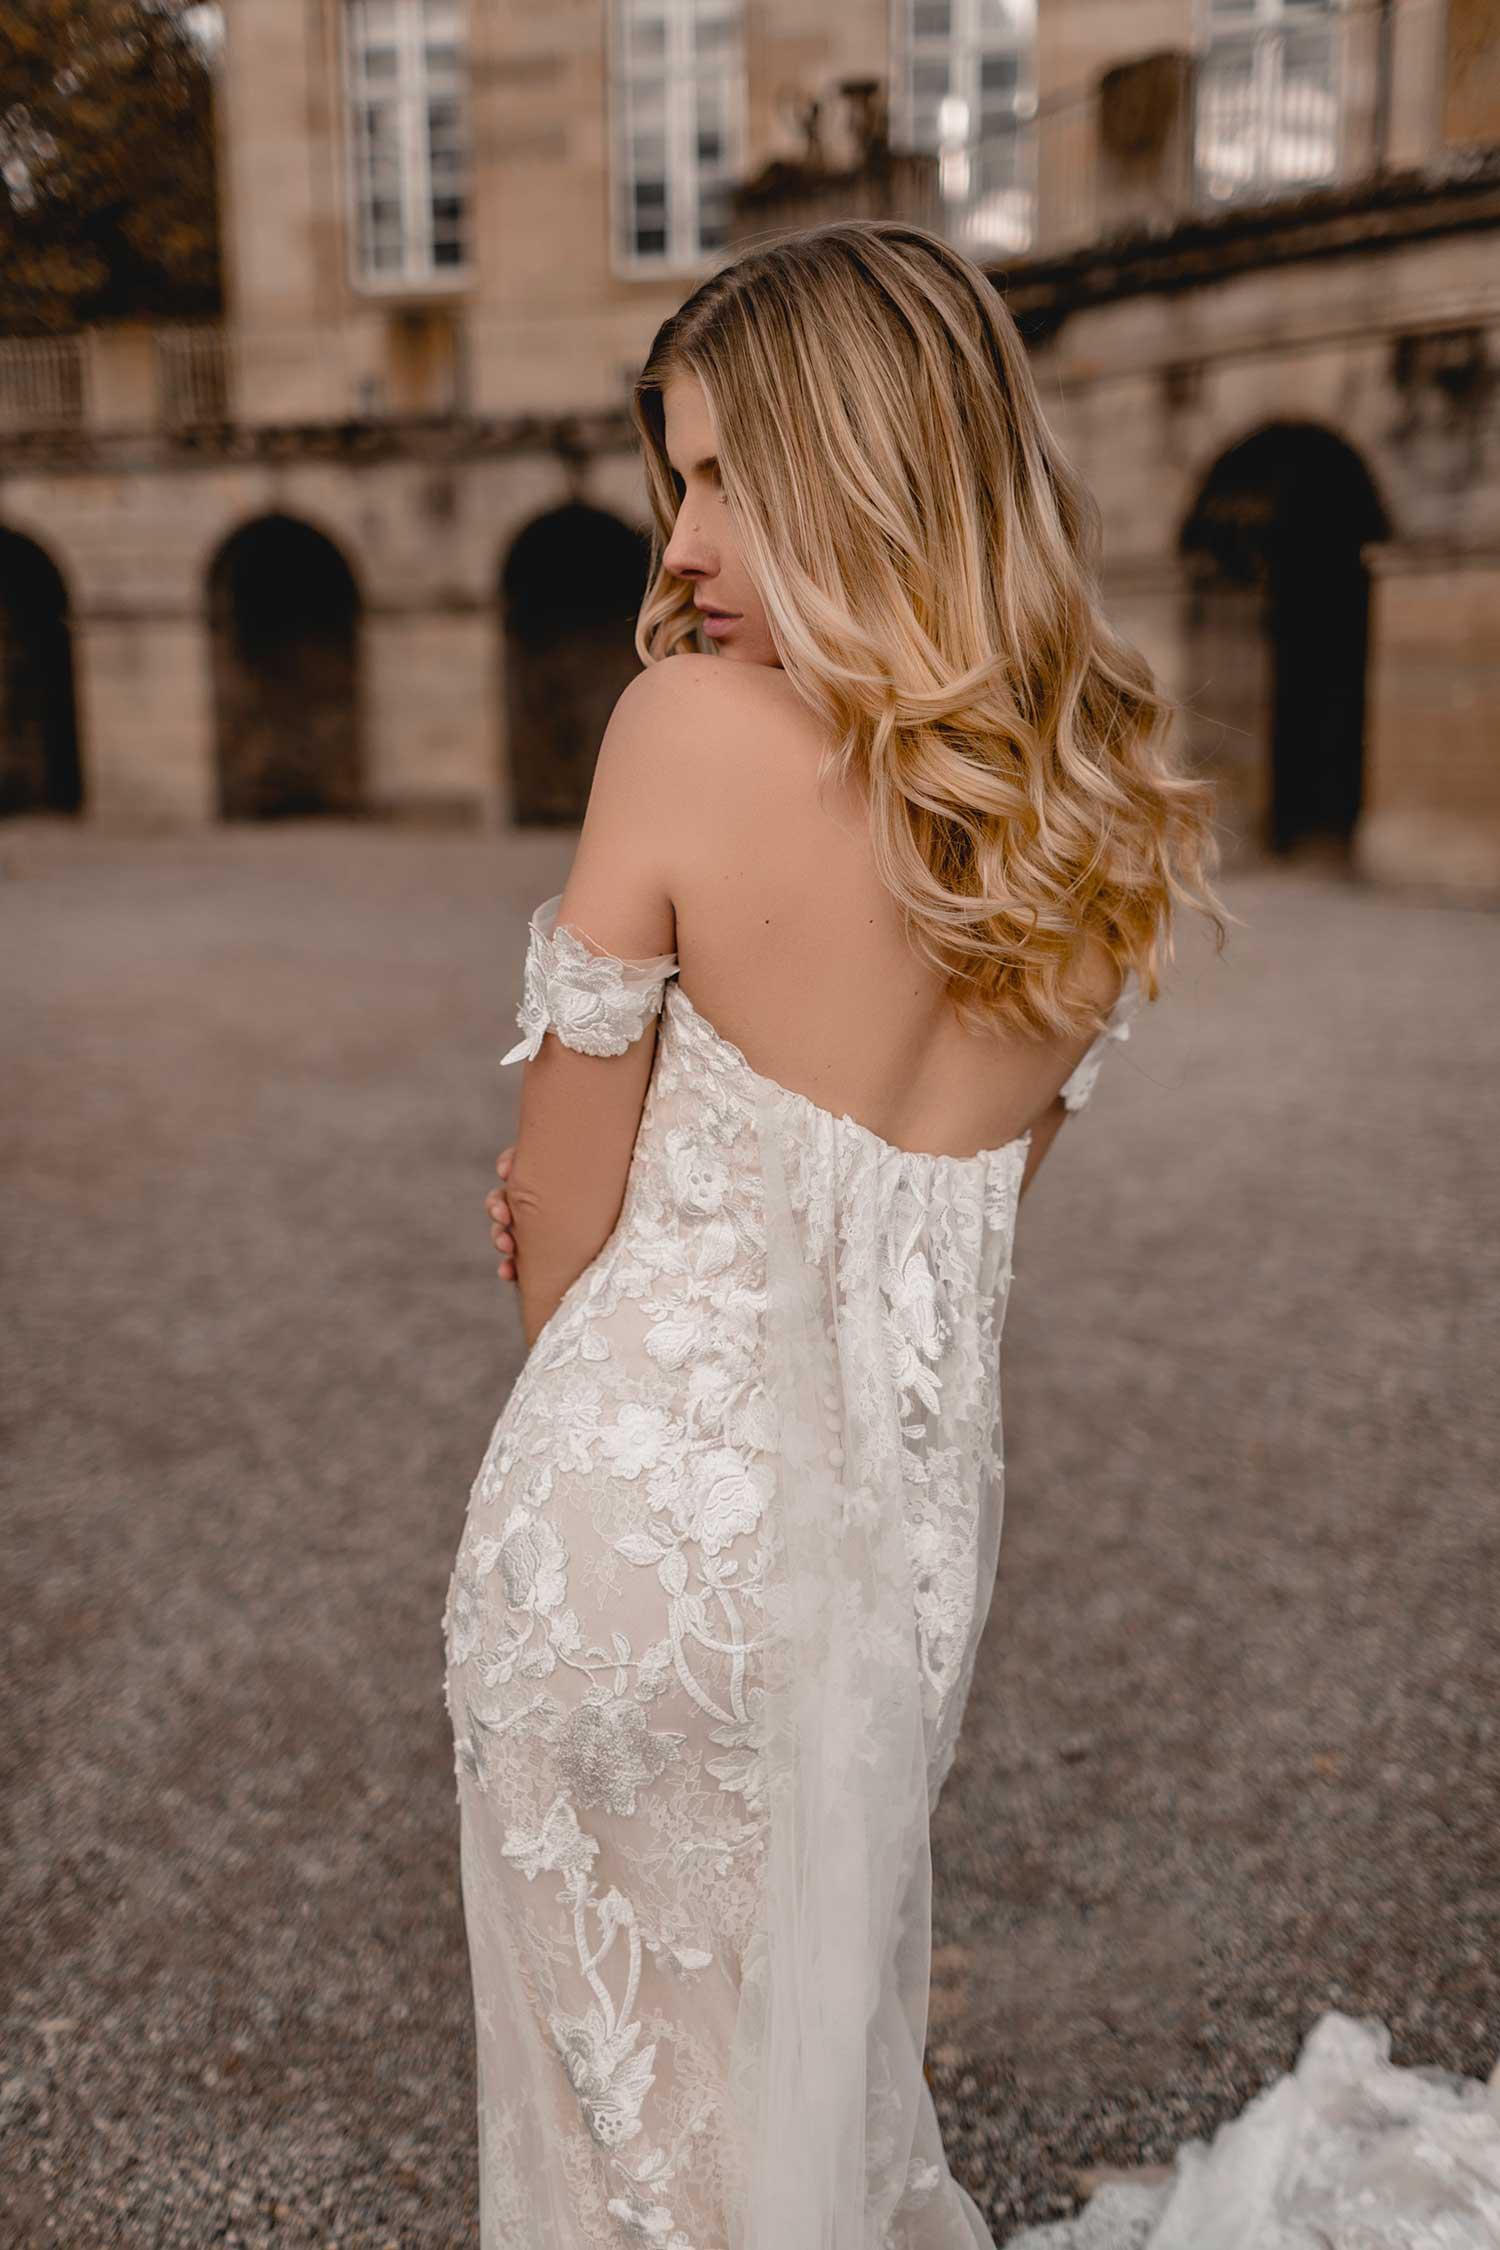 Bridal model posing in Monrepos Palace